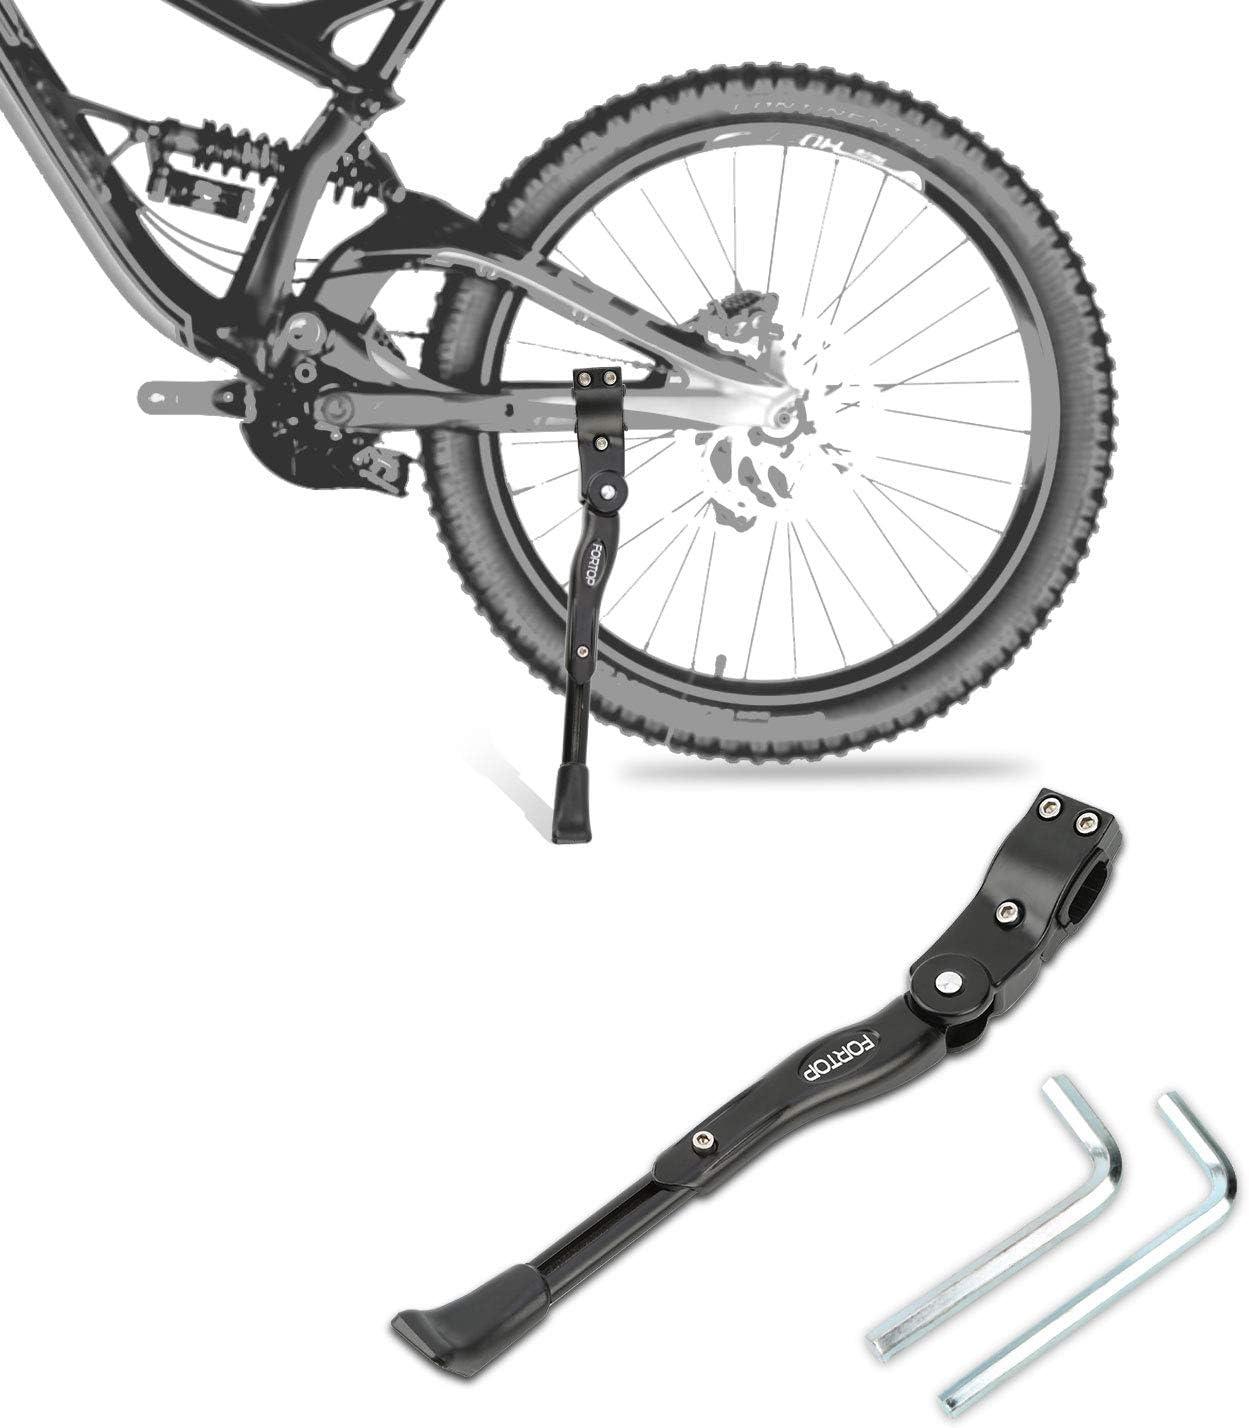 "FORTOP Bike Support Bicycle Kickstand Adjustable Aluminum Alloy for 22"" 24"" 26"" 28"" Mountain Bike/Road Bicycle/BMX/MTB/City Commuter Bike/Kids Bike/Sports Bike/Adult Bike/700 Road Bike"